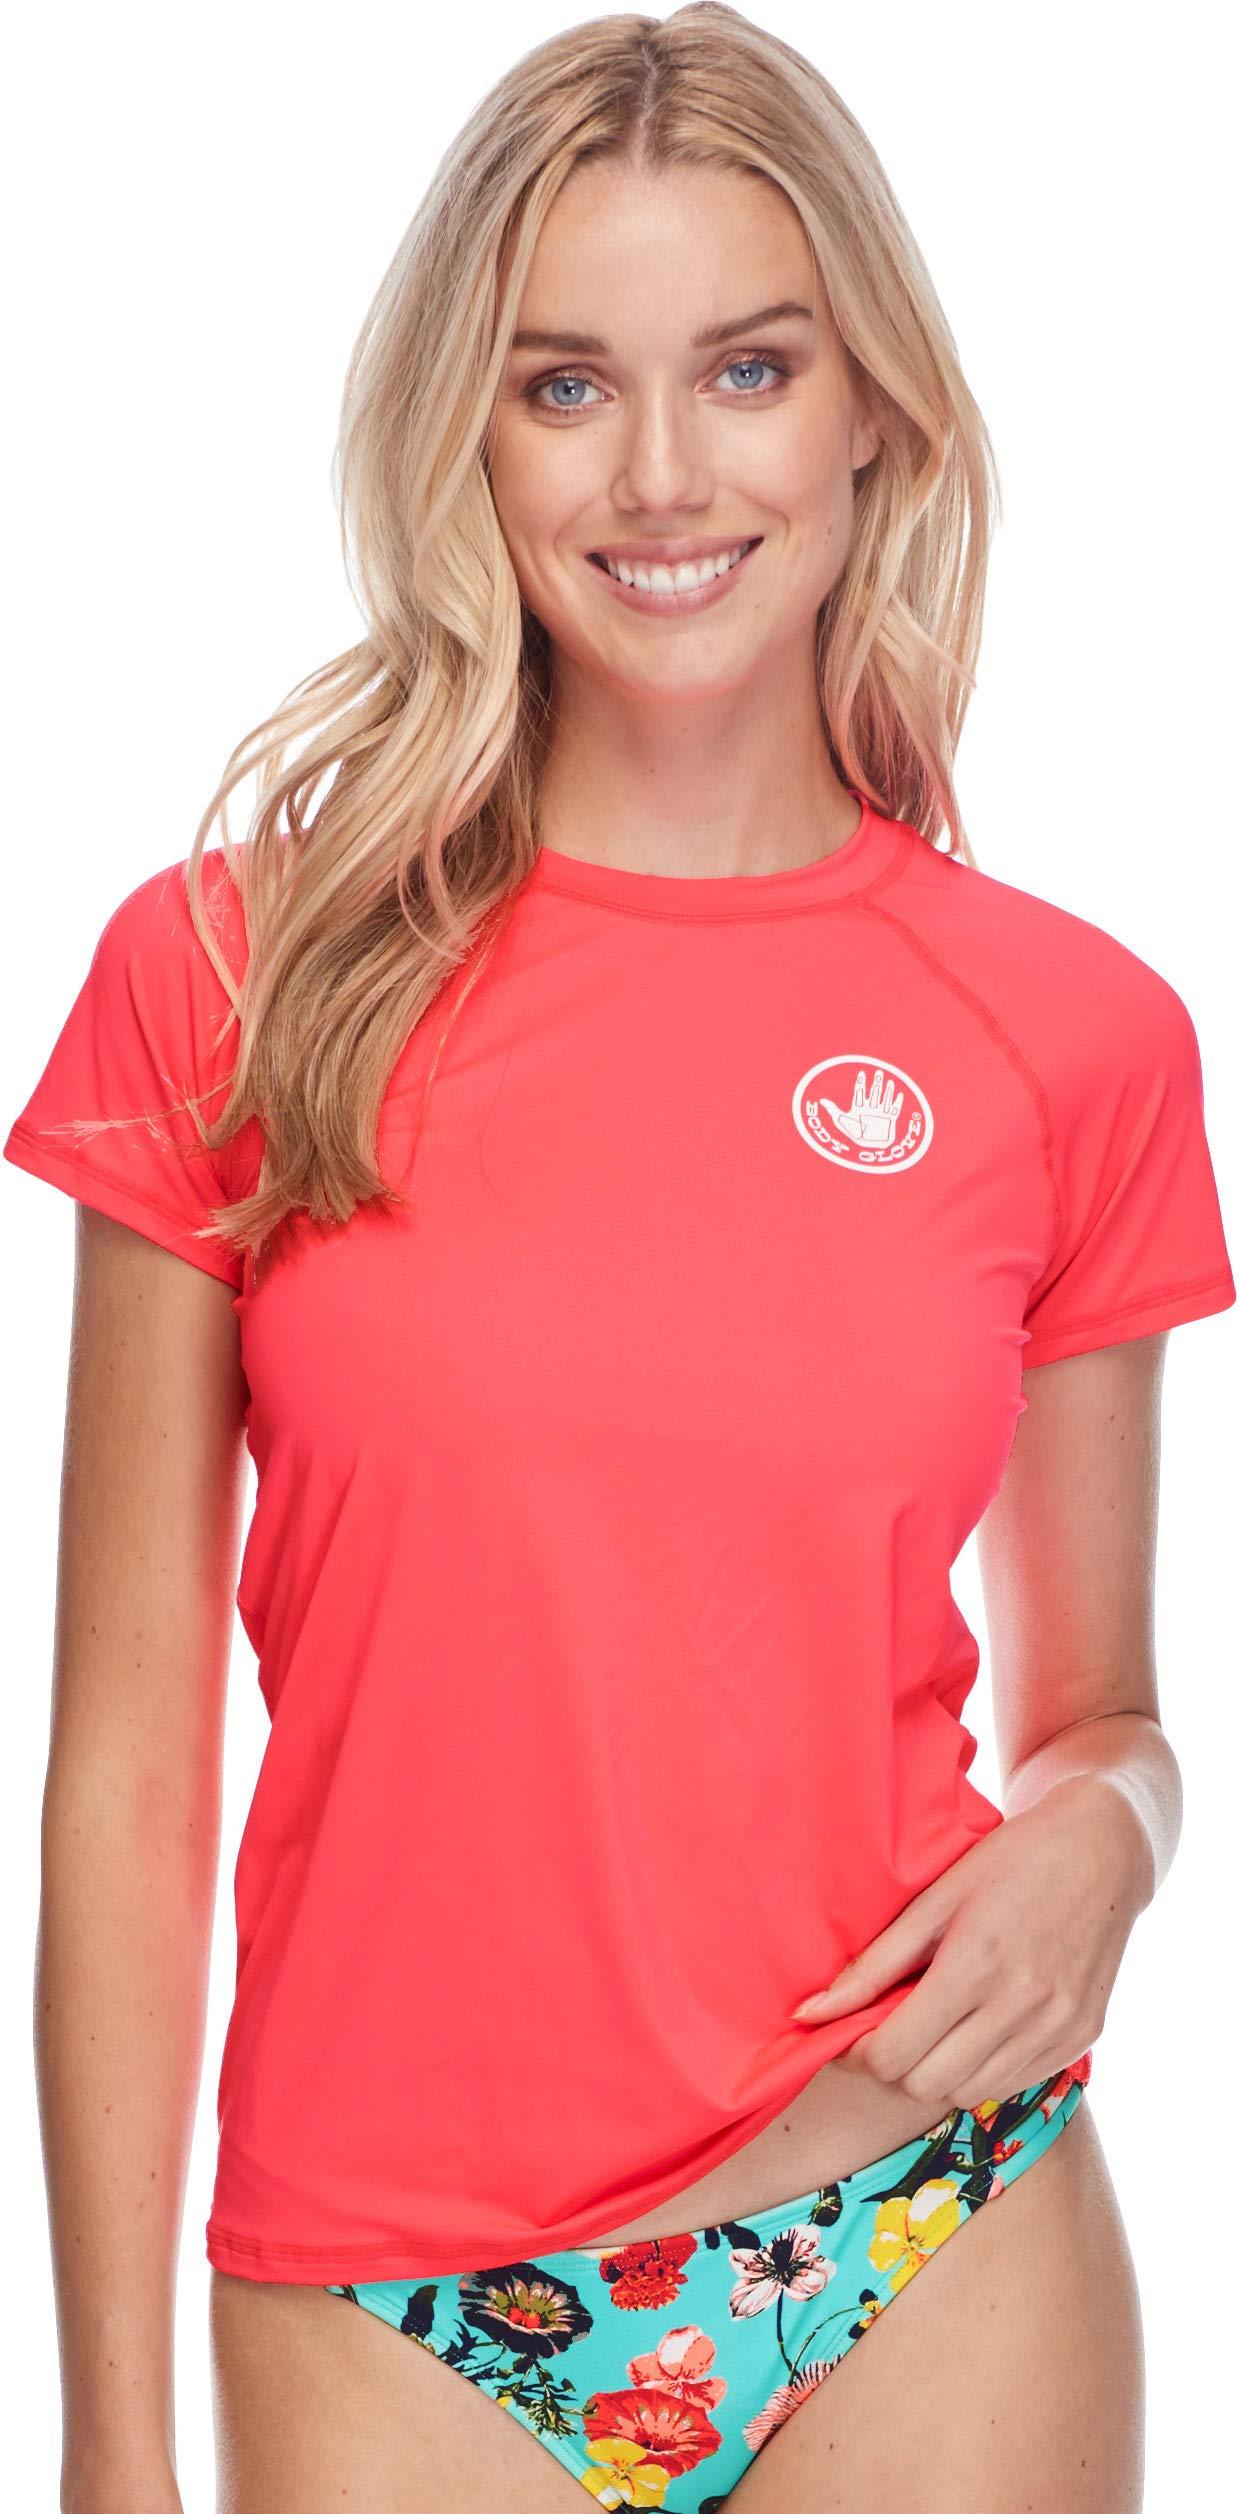 Body Glove Women's Smoothies in-Motion Short Sleeve Rashguard with UPF 50, Diva I, X-Small